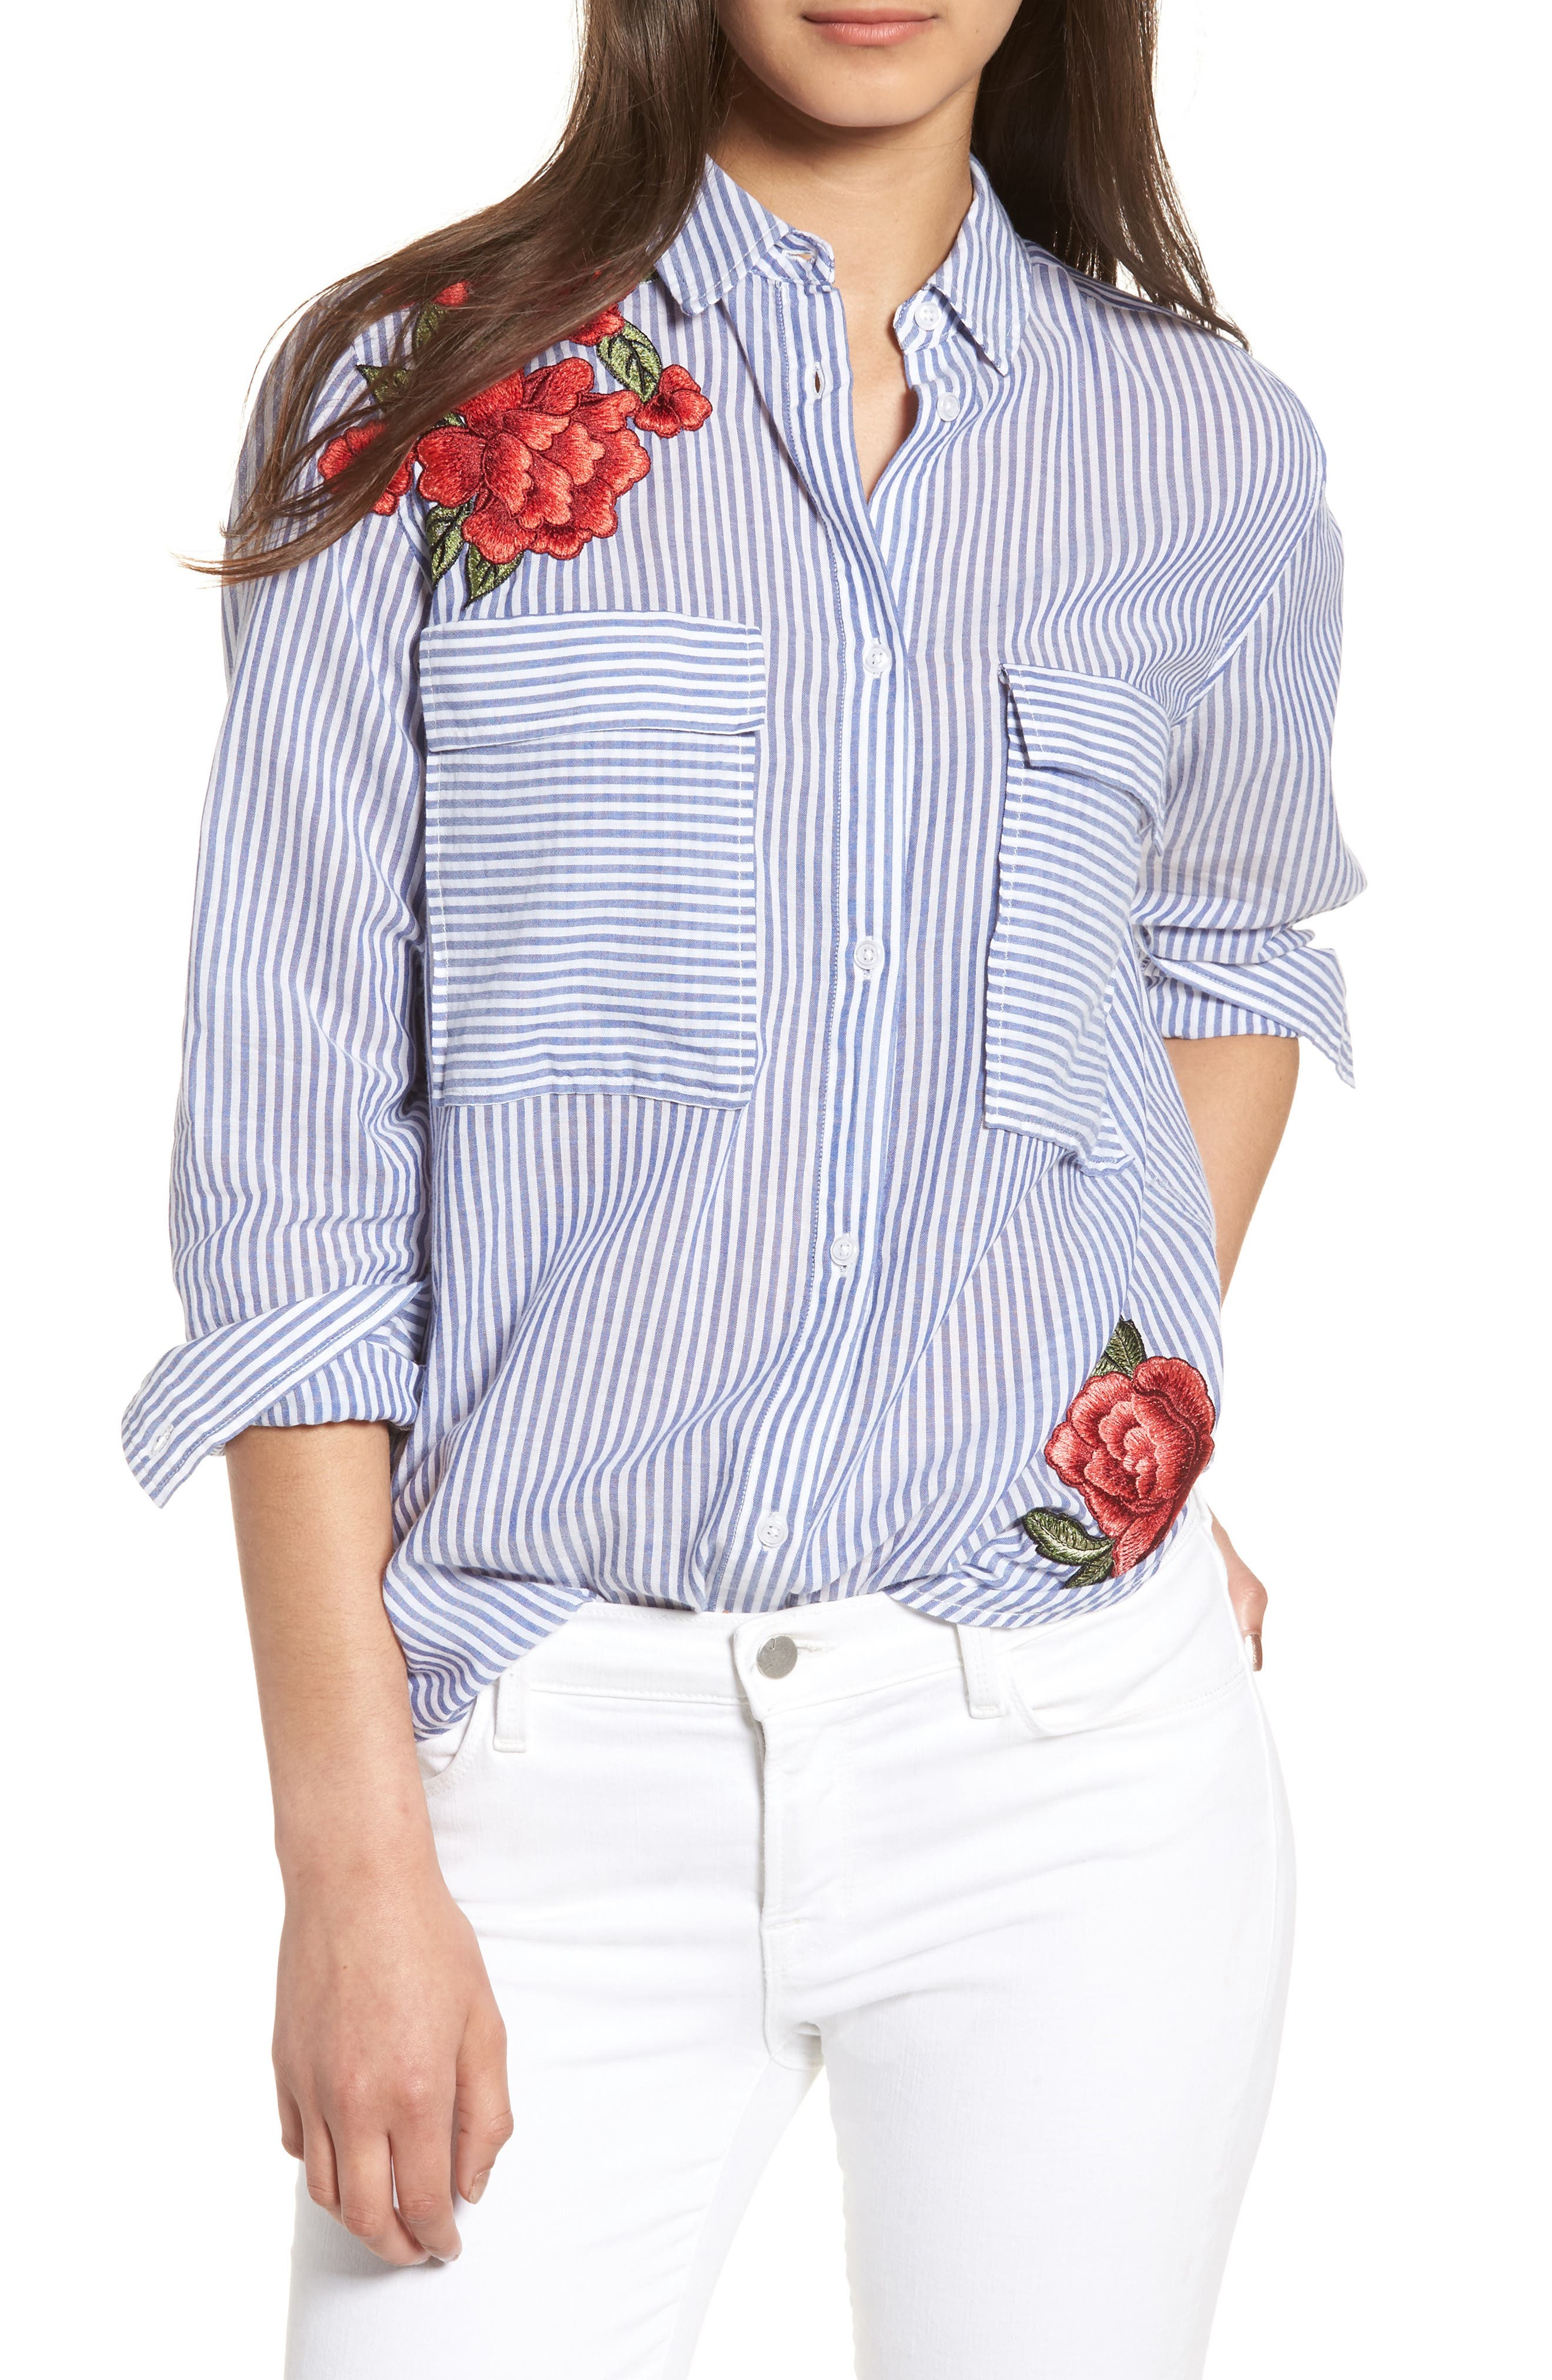 Main Image - Rails Frances Embroidered Stripe Shirt